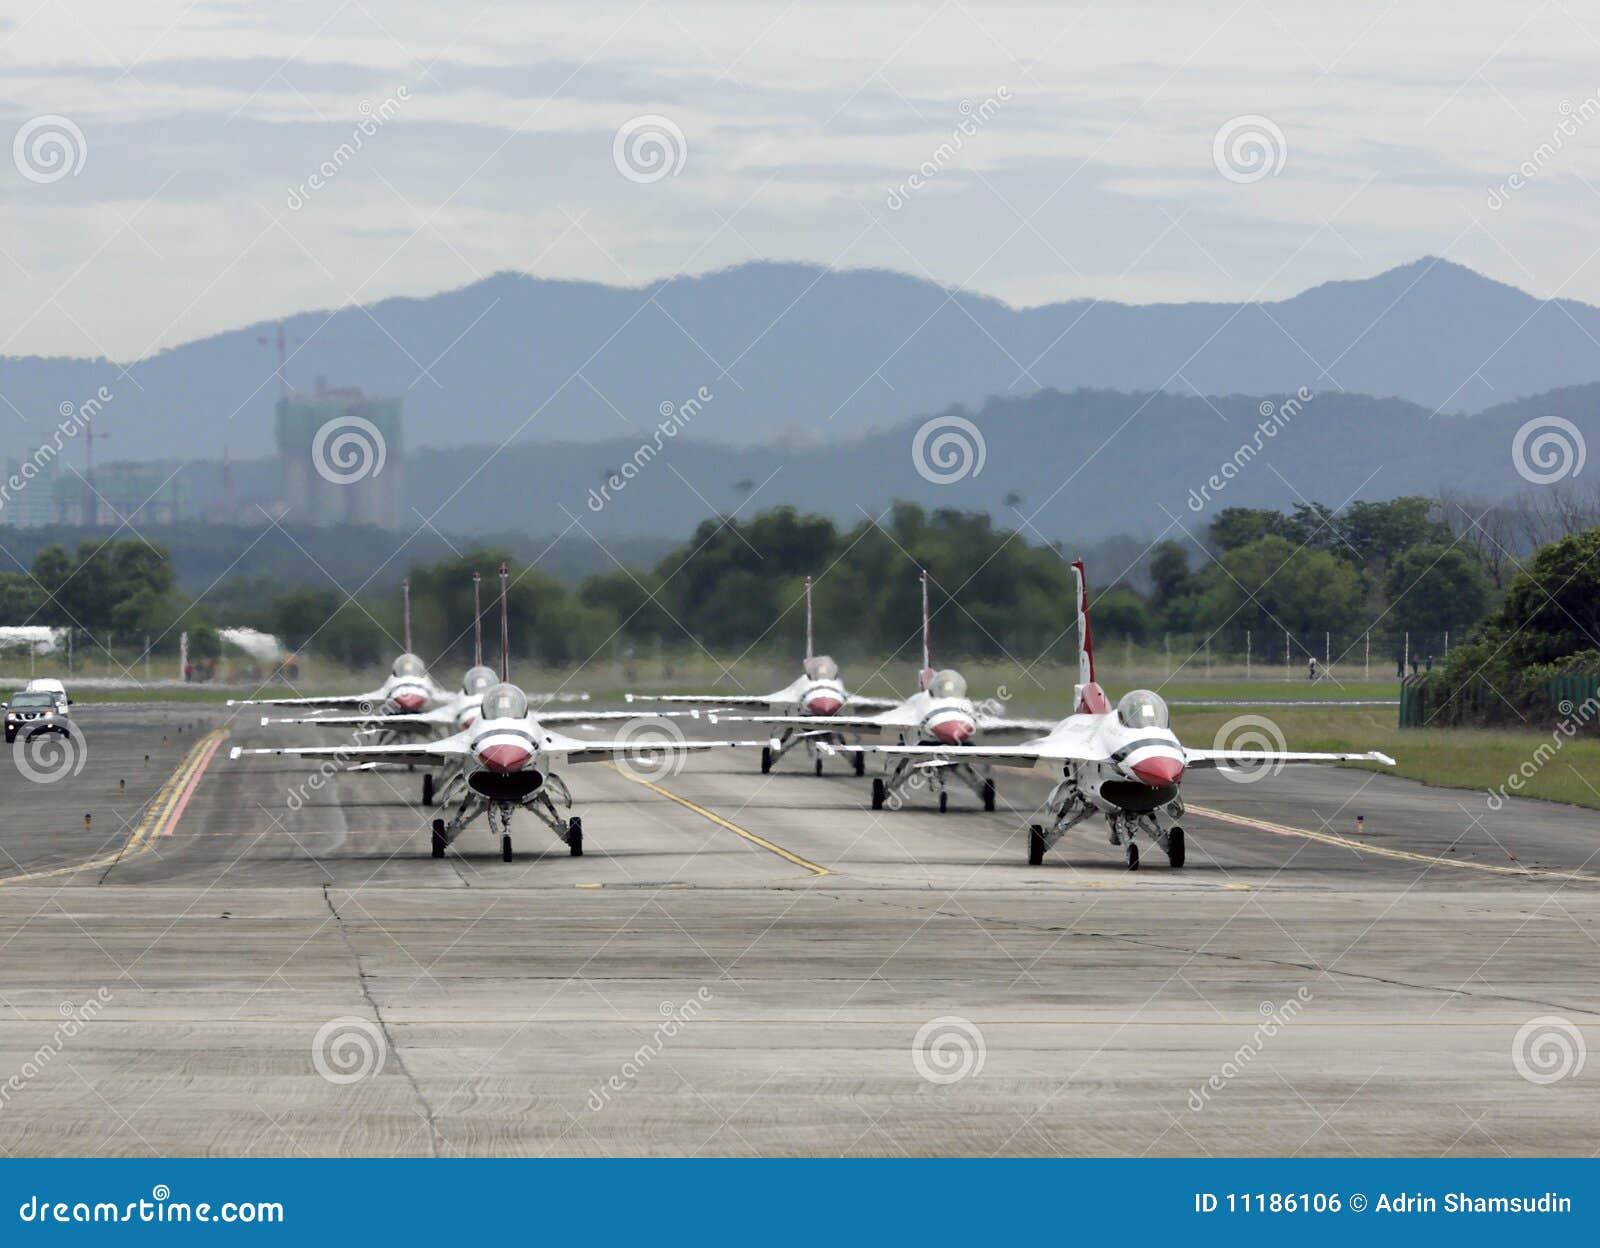 AirshowthunderbirdsU.S.A.F.